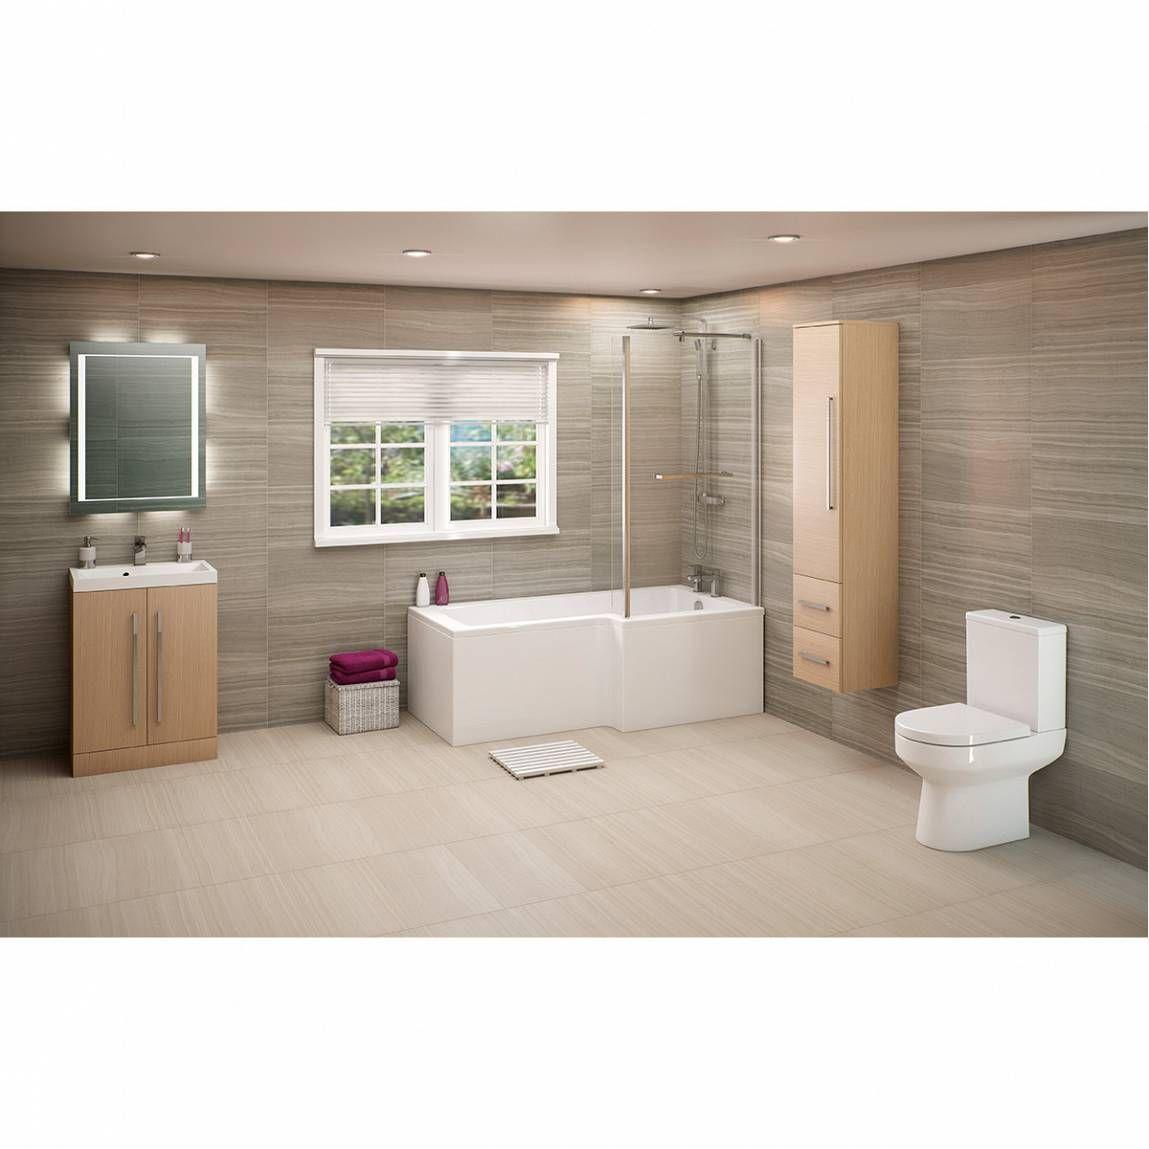 Plumbs bathroom suites - Drift Shower Bath Suite Rh Victoria Plumb